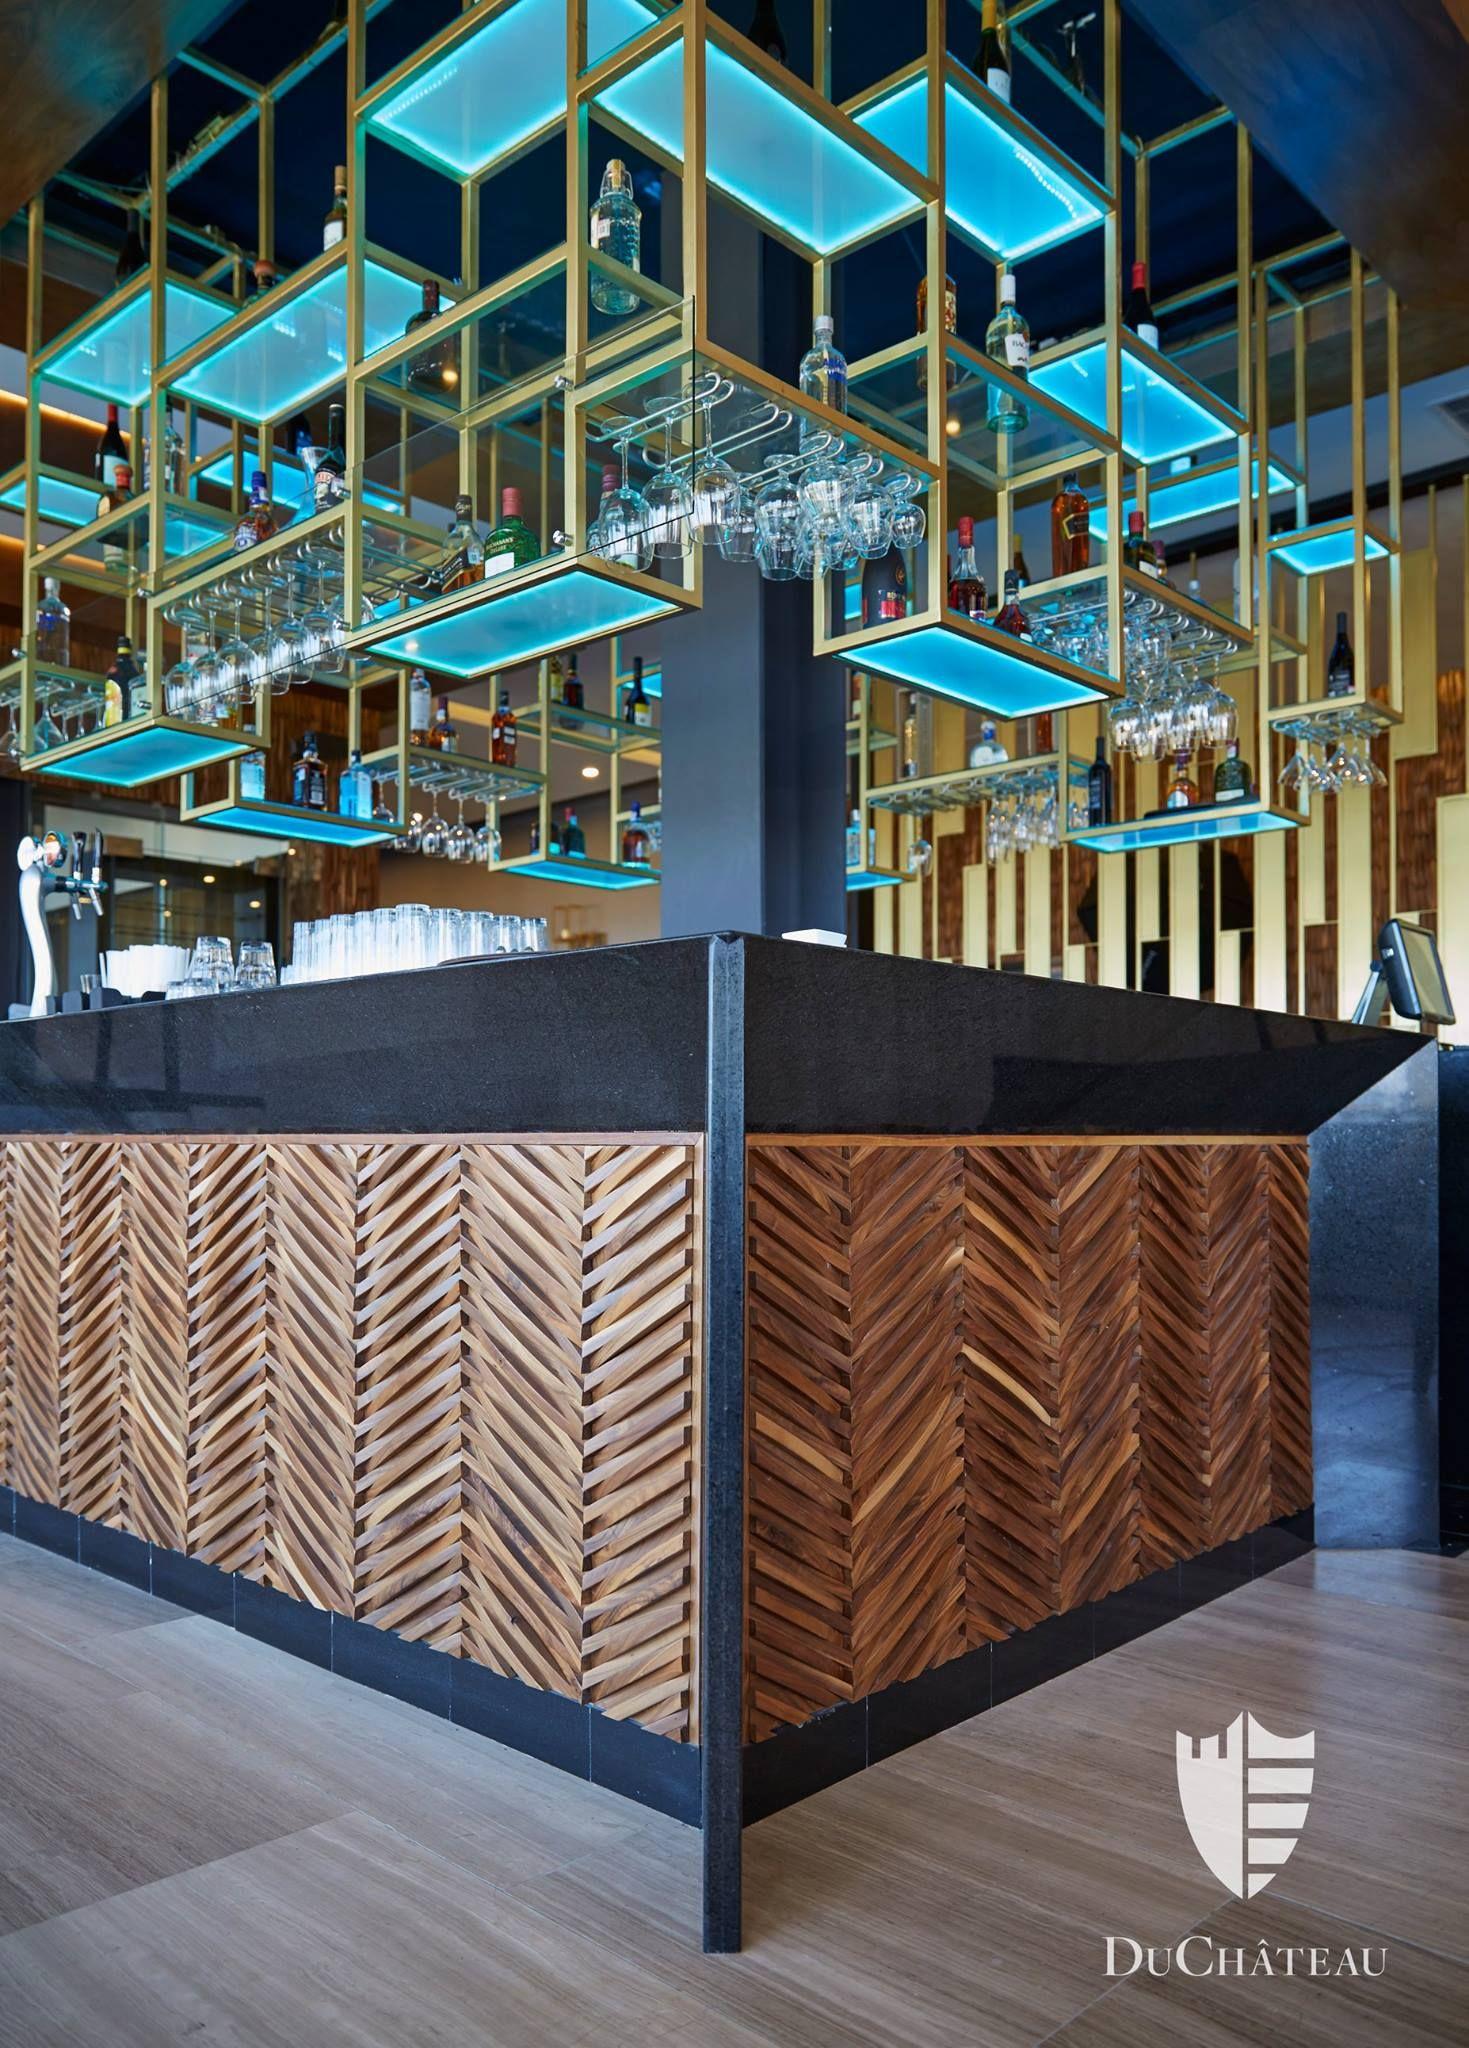 Beautiful Wall Covering At This Bar Bar Design Restaurant Luxury Bar Bar Interior